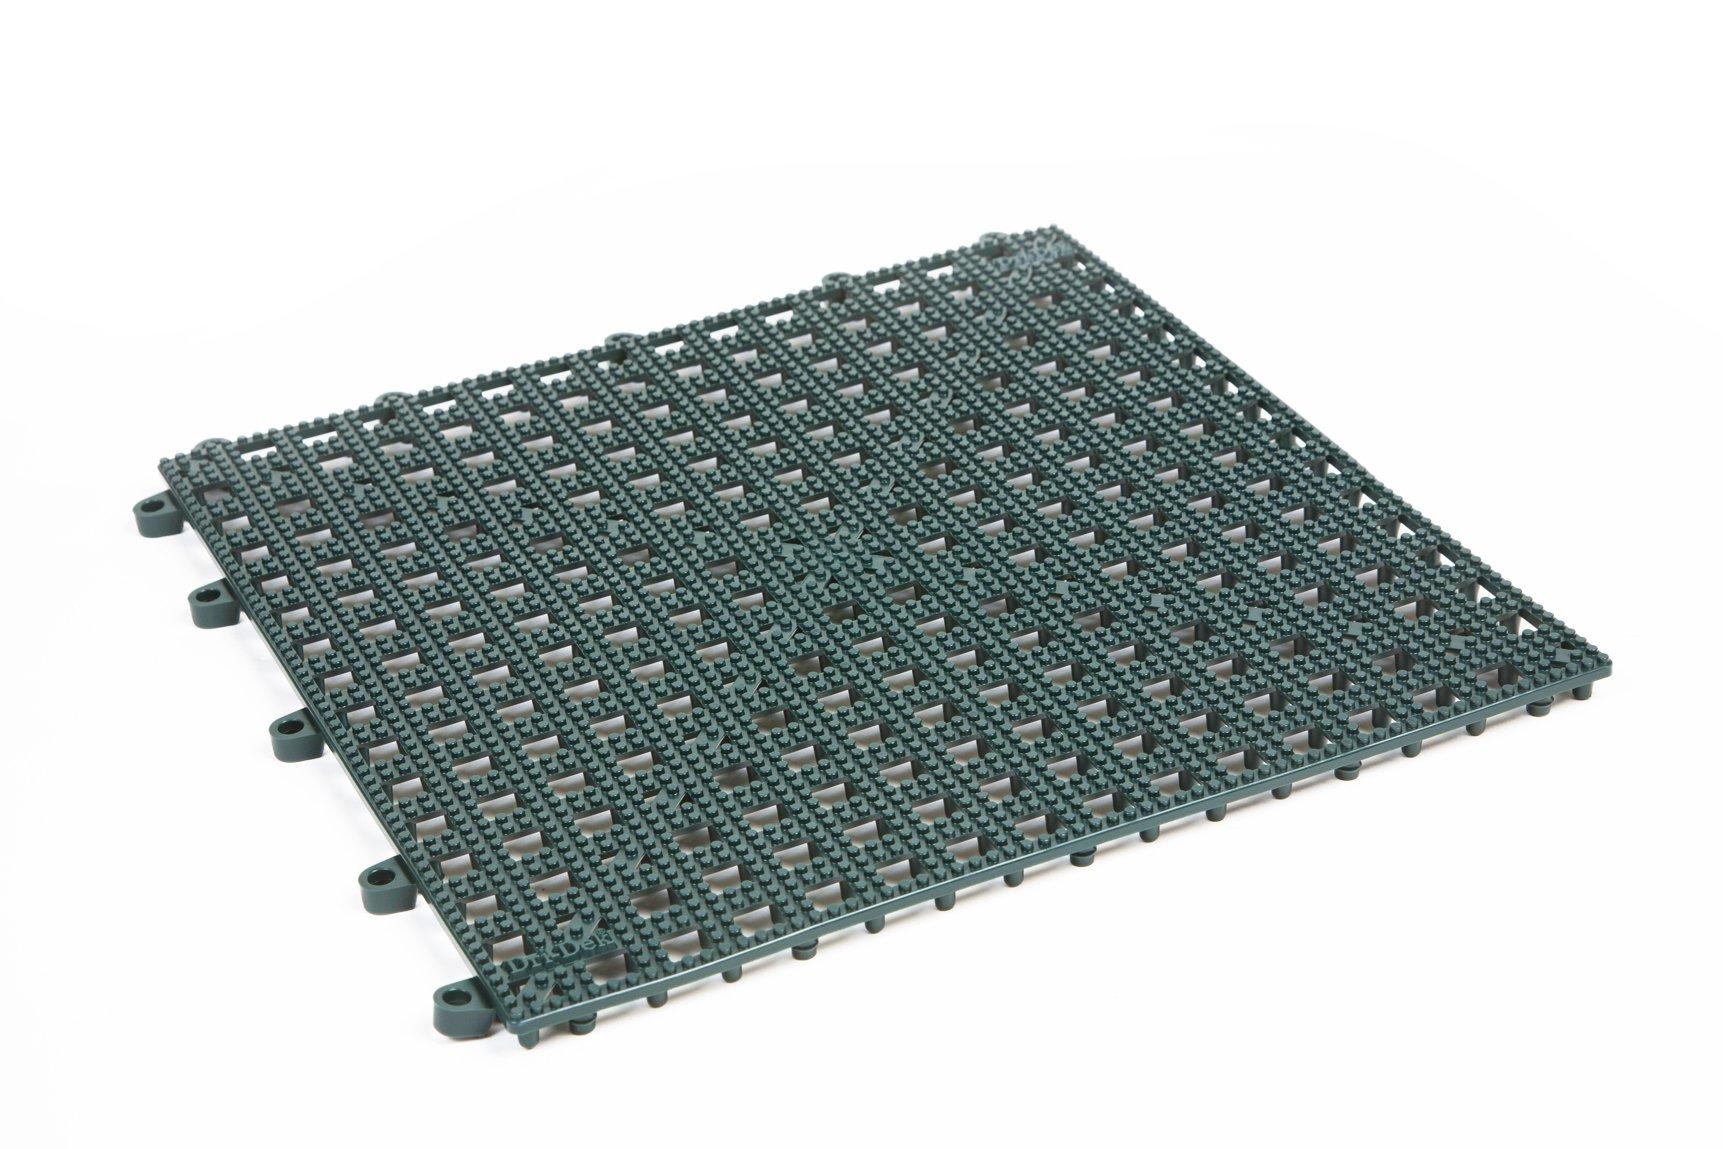 Dri-Dek Dog & Cat Kennel Cage Liner, Veterinarian or Groomer Flooring - 1'x1' Interlocking Tiles - 12-Pack (Hunter Green)